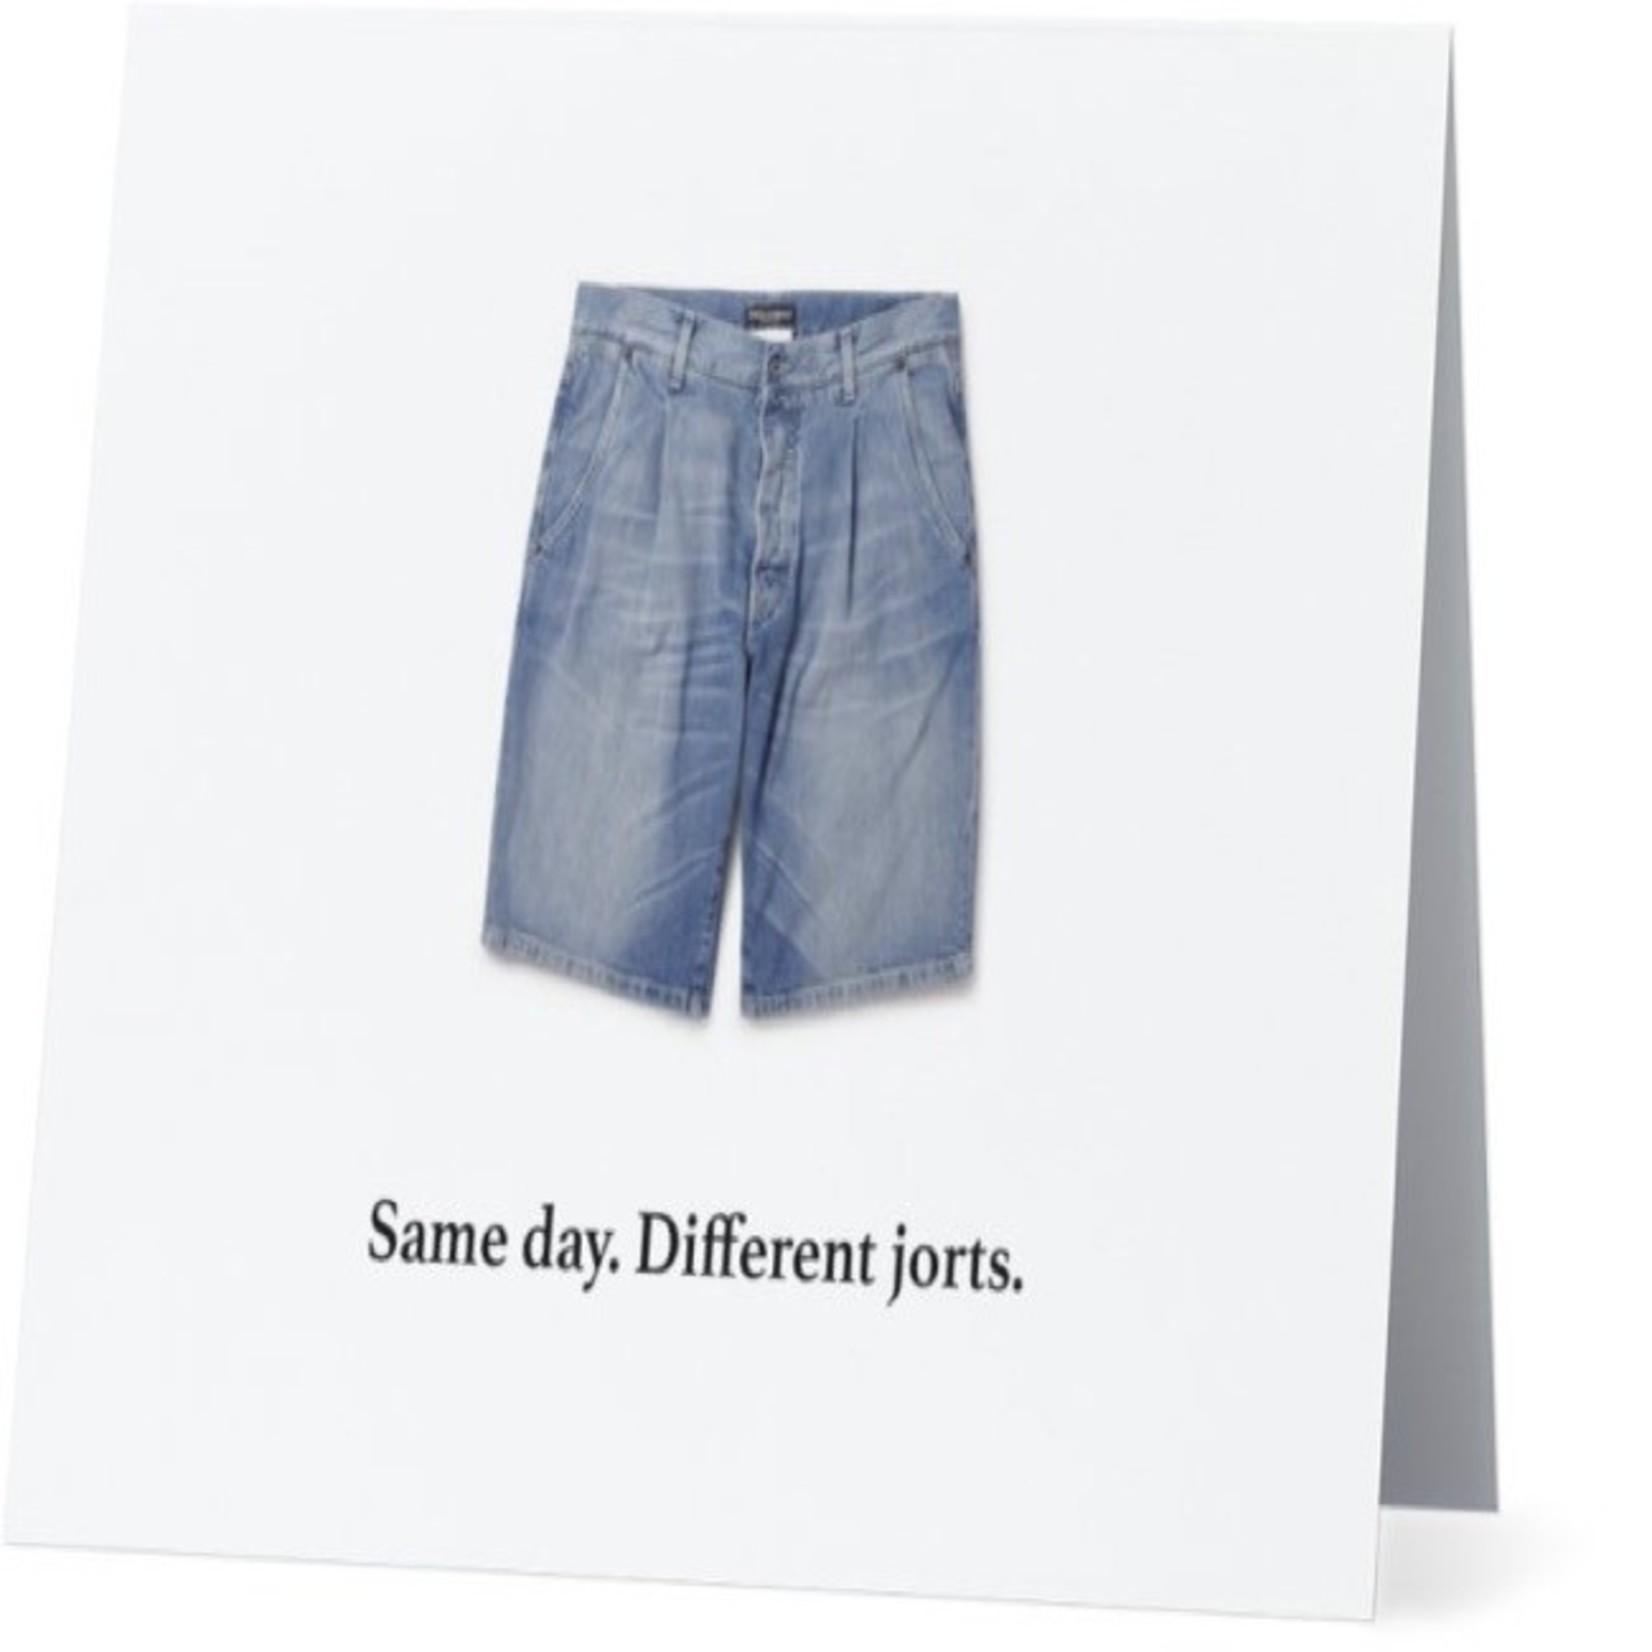 Bad Annie's Card #086 - Same Day, Different Jorts